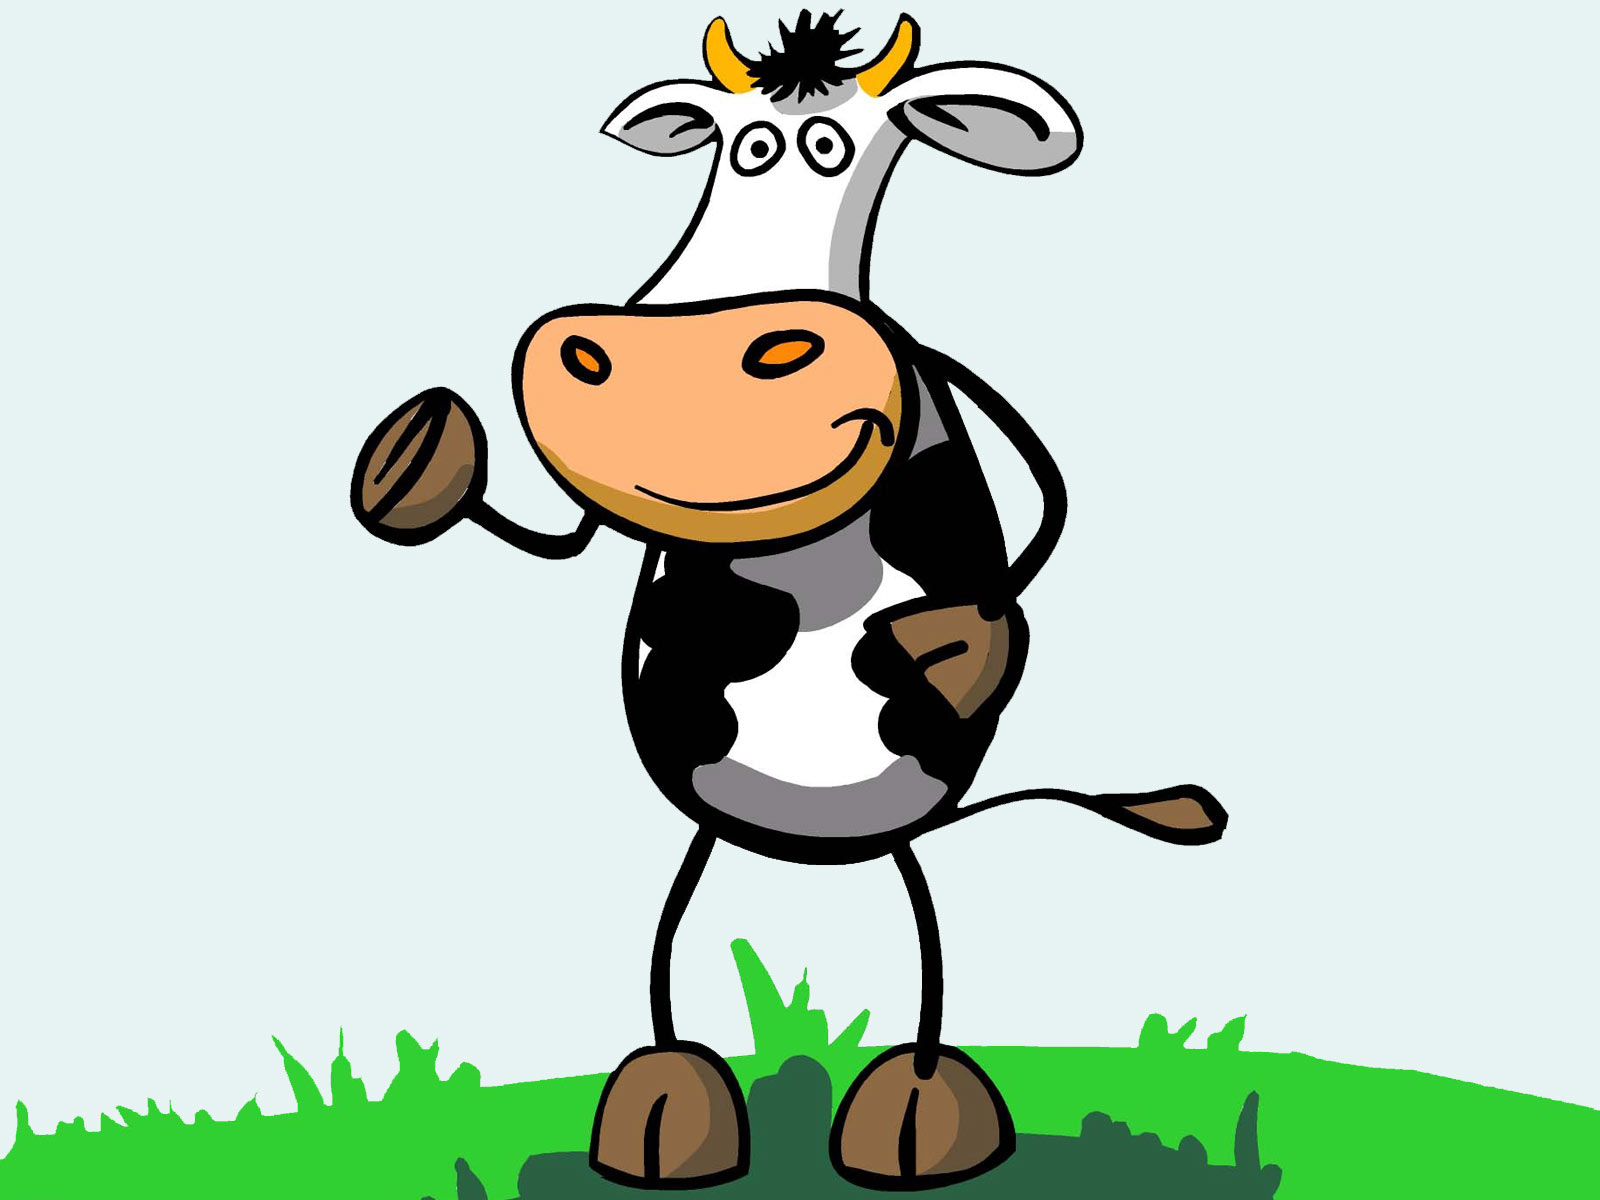 Cartoon Cows Wallpaper Cartoon Wallpaper